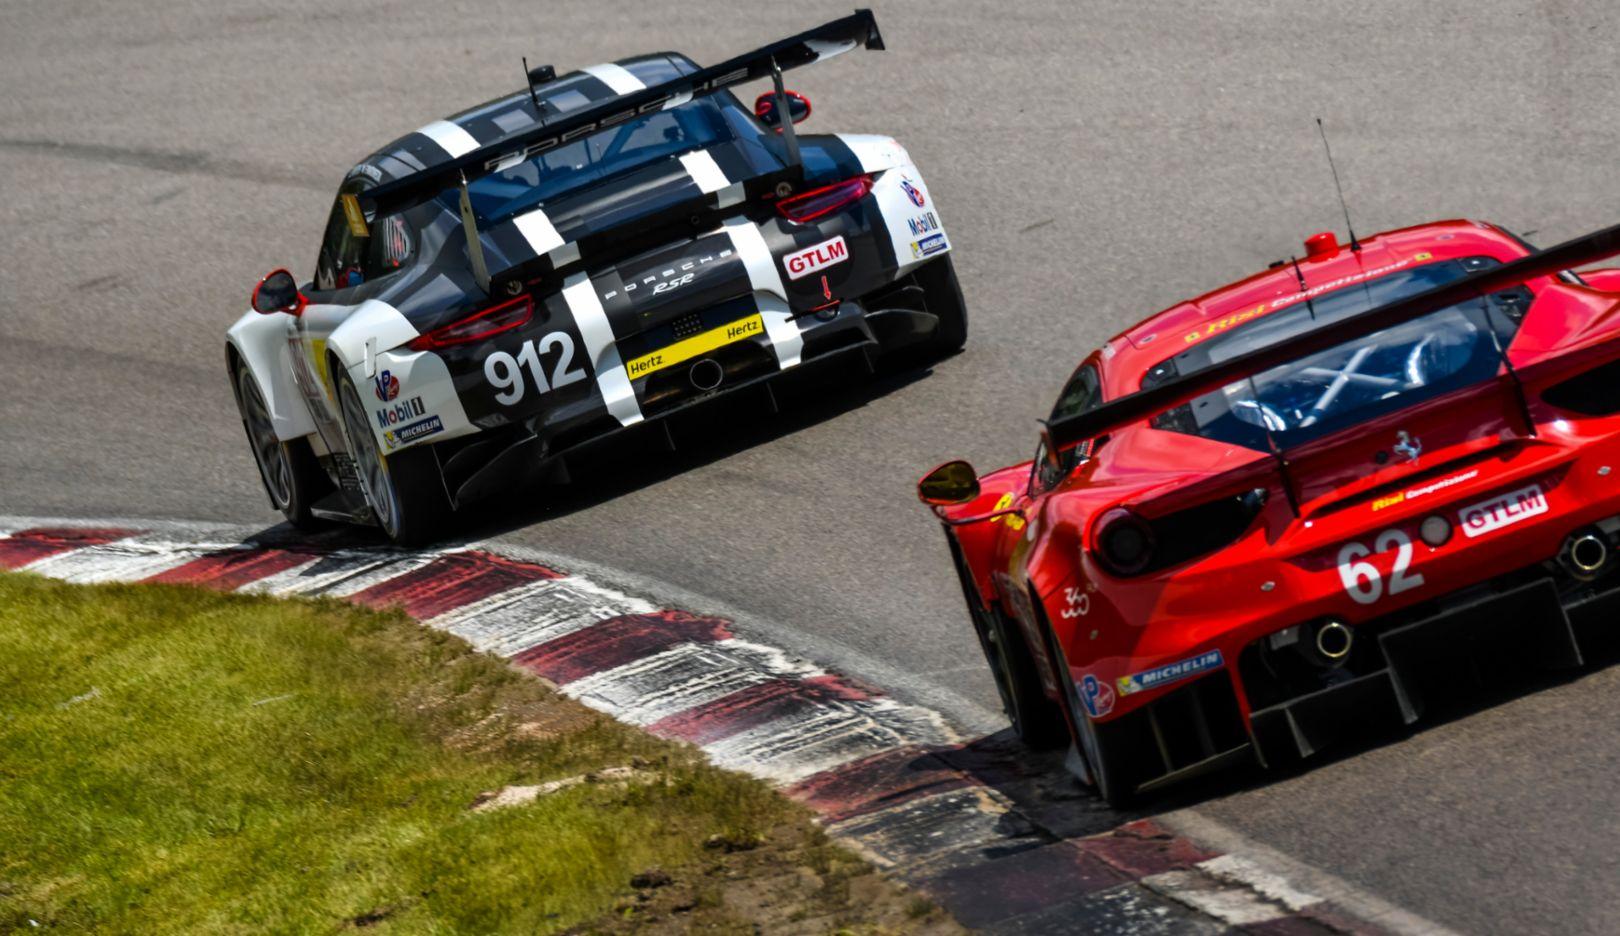 Porsche 911 RSR, Bowmanville, IMSA WeatherTech SportsCar Championship, 2016, Porsche AG